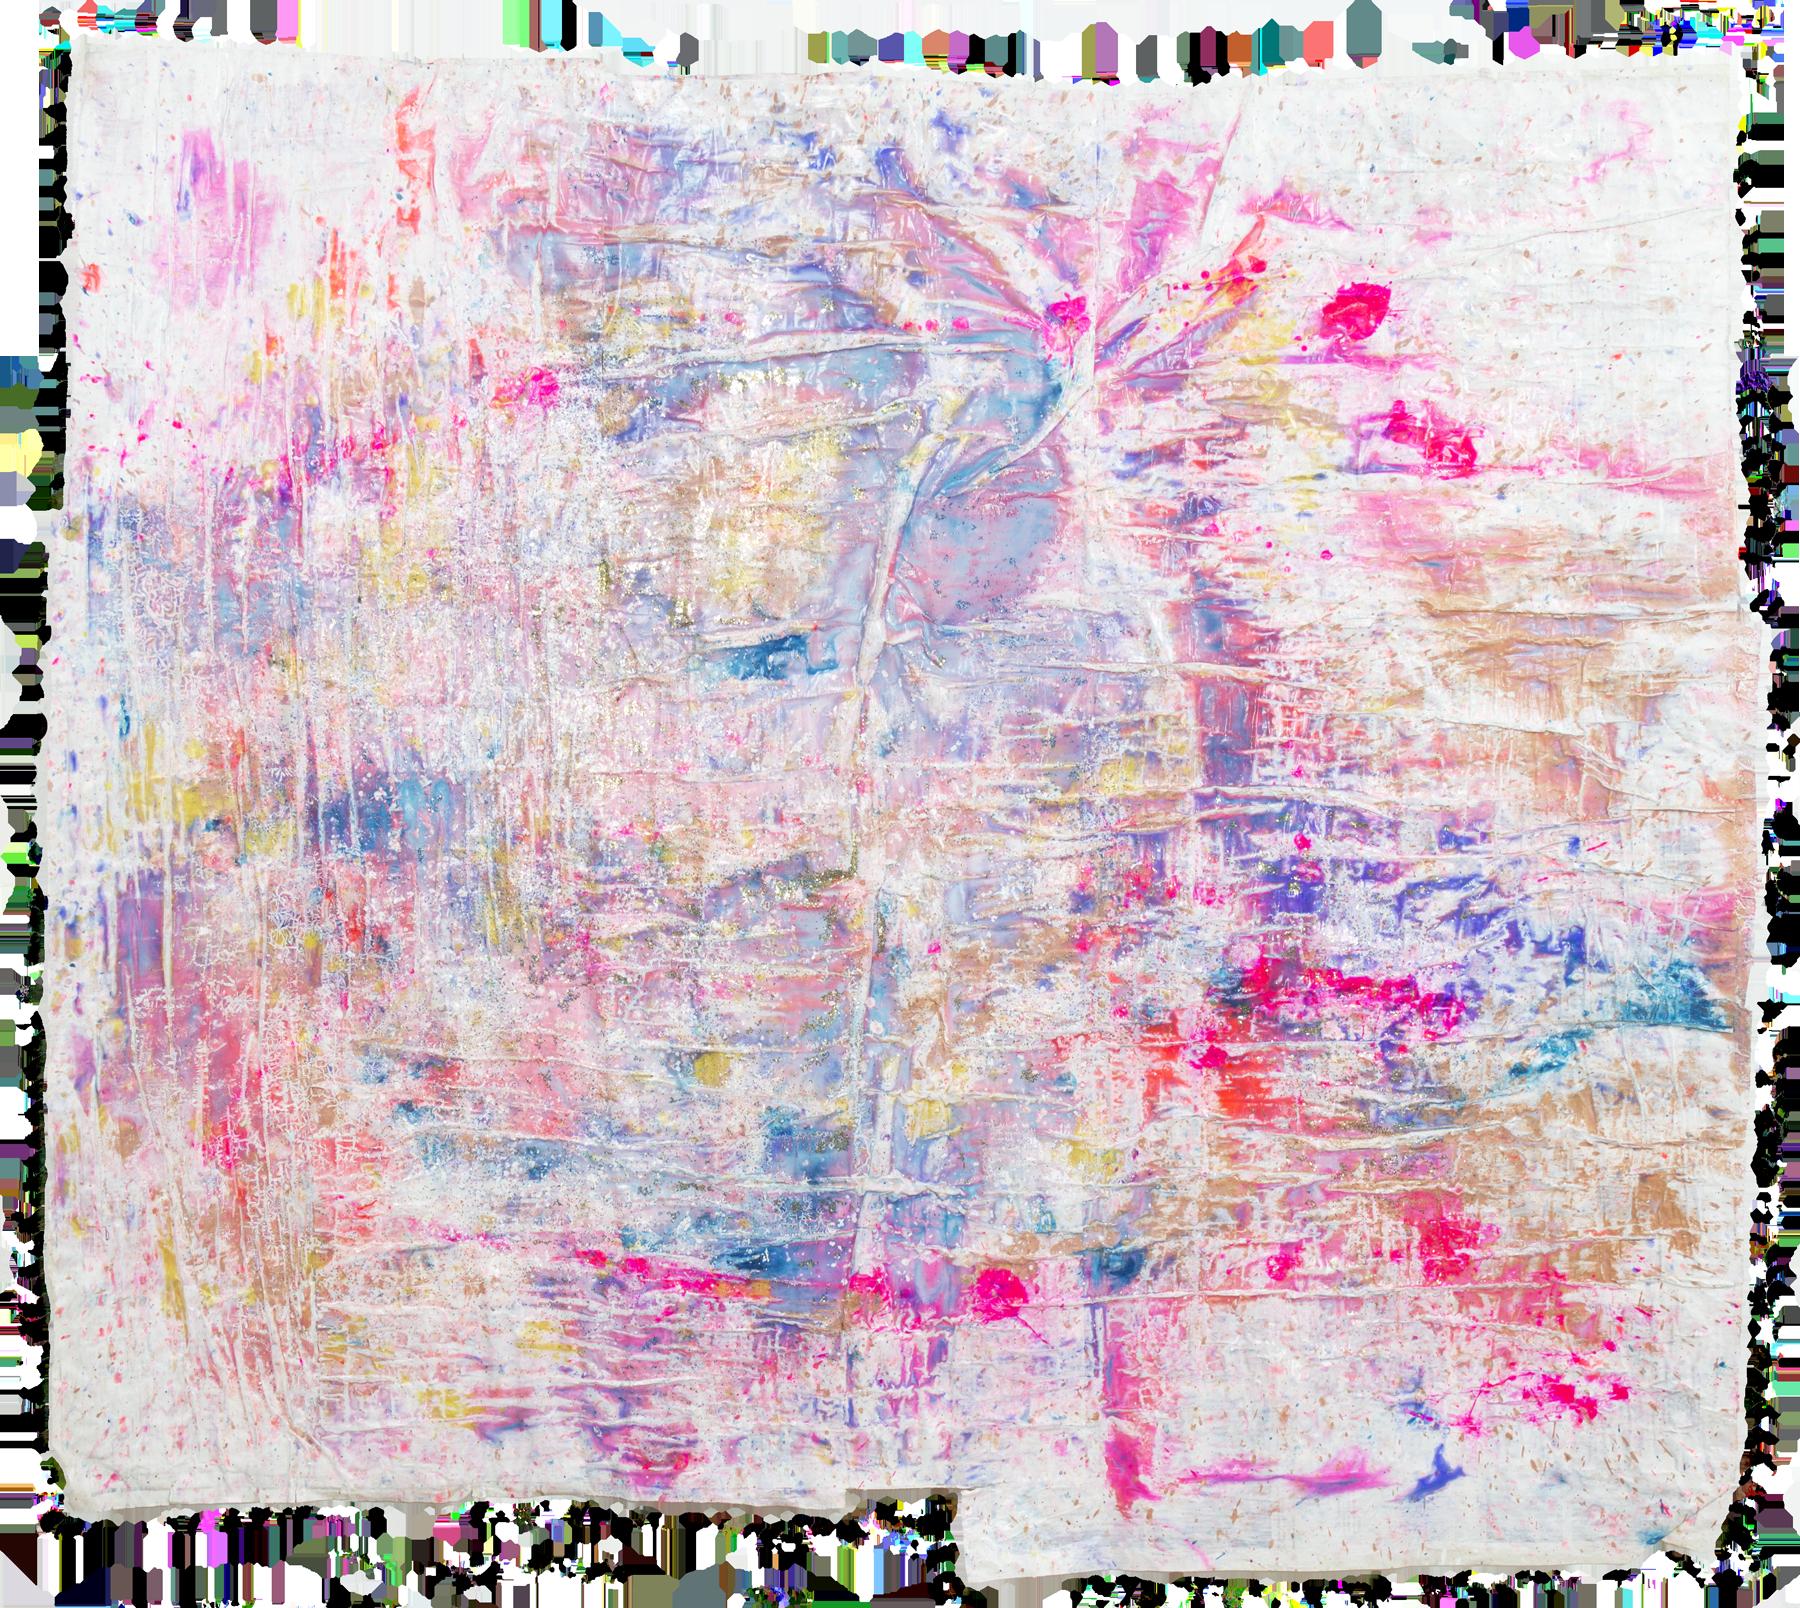 Sparkling skies NO. 7', 96 x 110 cm, acrylic paint on handmade paper-base, Kerstin Pressler, www.kerstinpressler.com